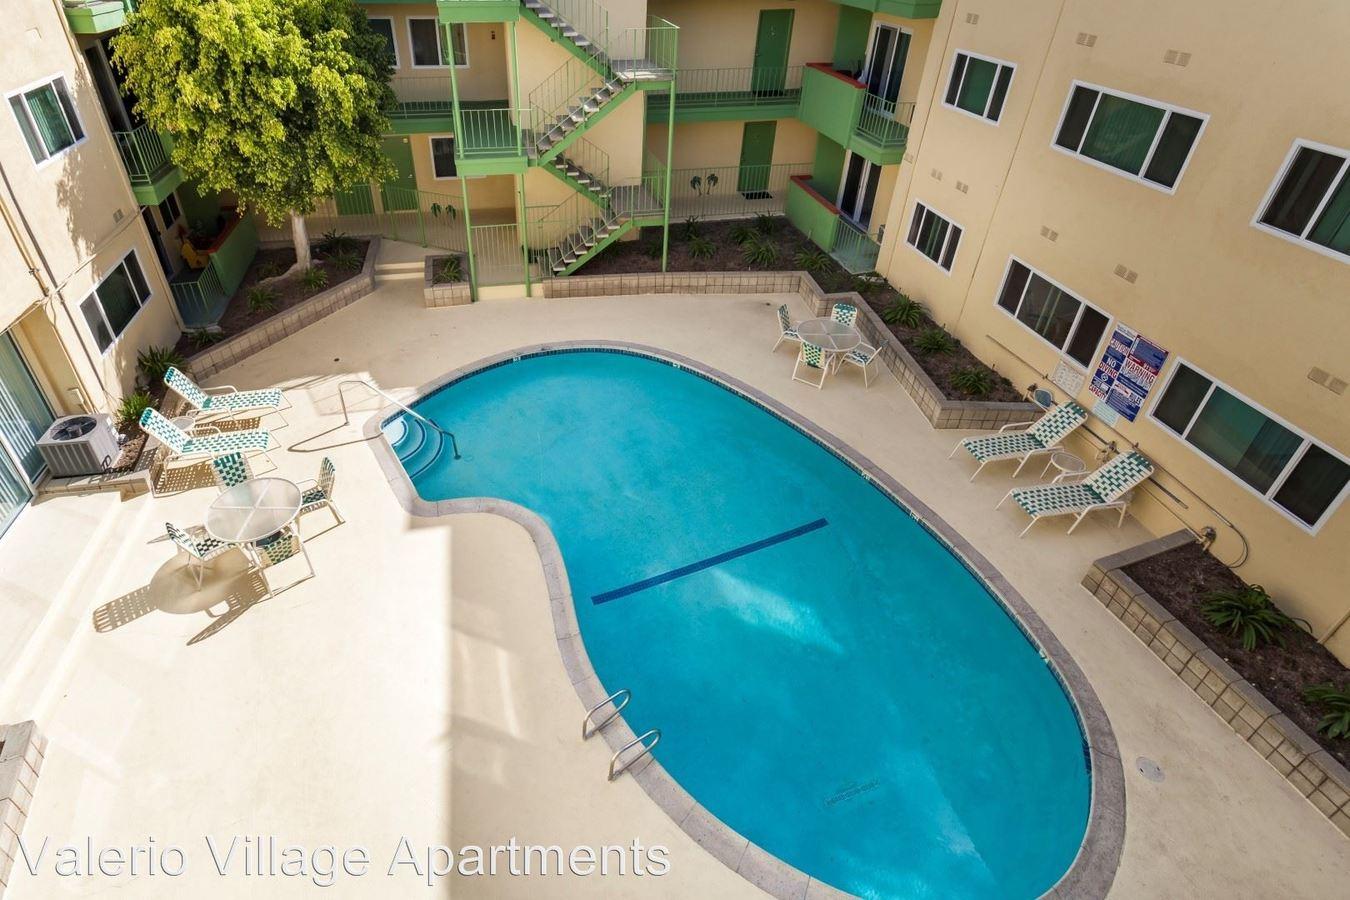 2 Bedrooms 2 Bathrooms Apartment for rent at 14360 Valerio Street in Van Nuys, CA